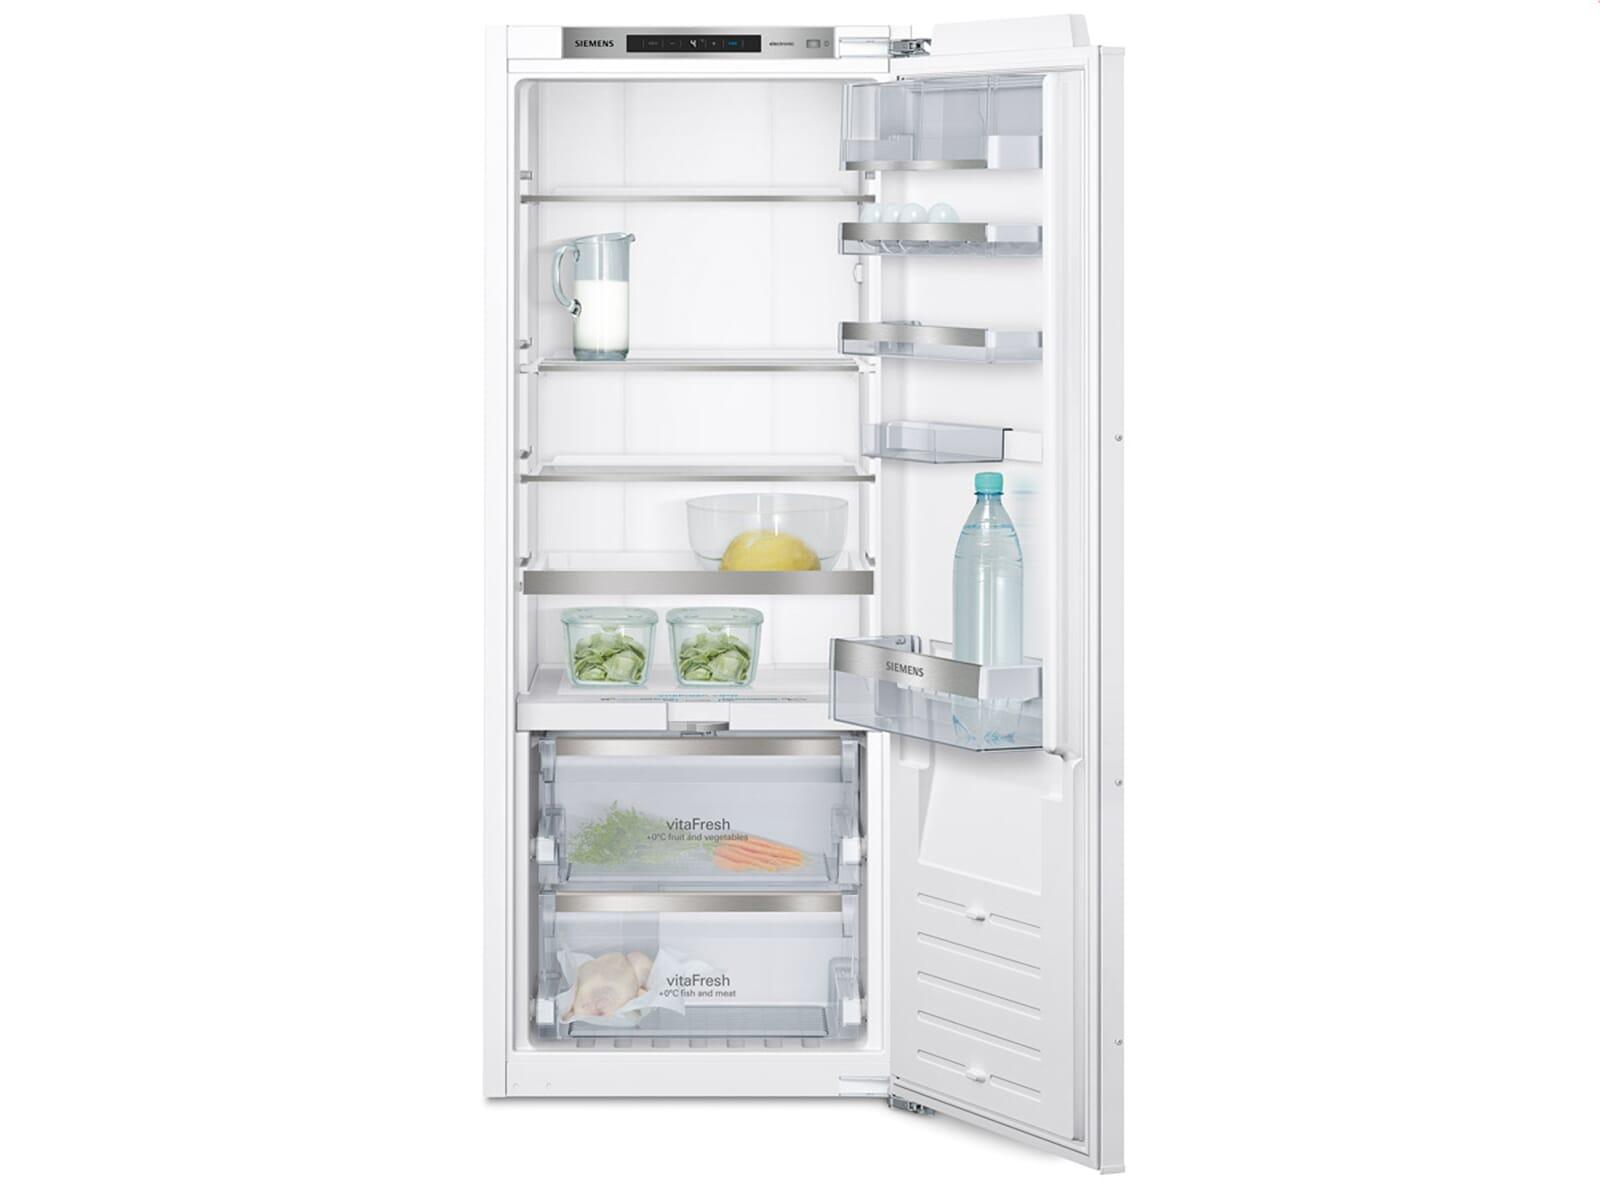 Siemens KI51FAD30 Einbaukühlschrank